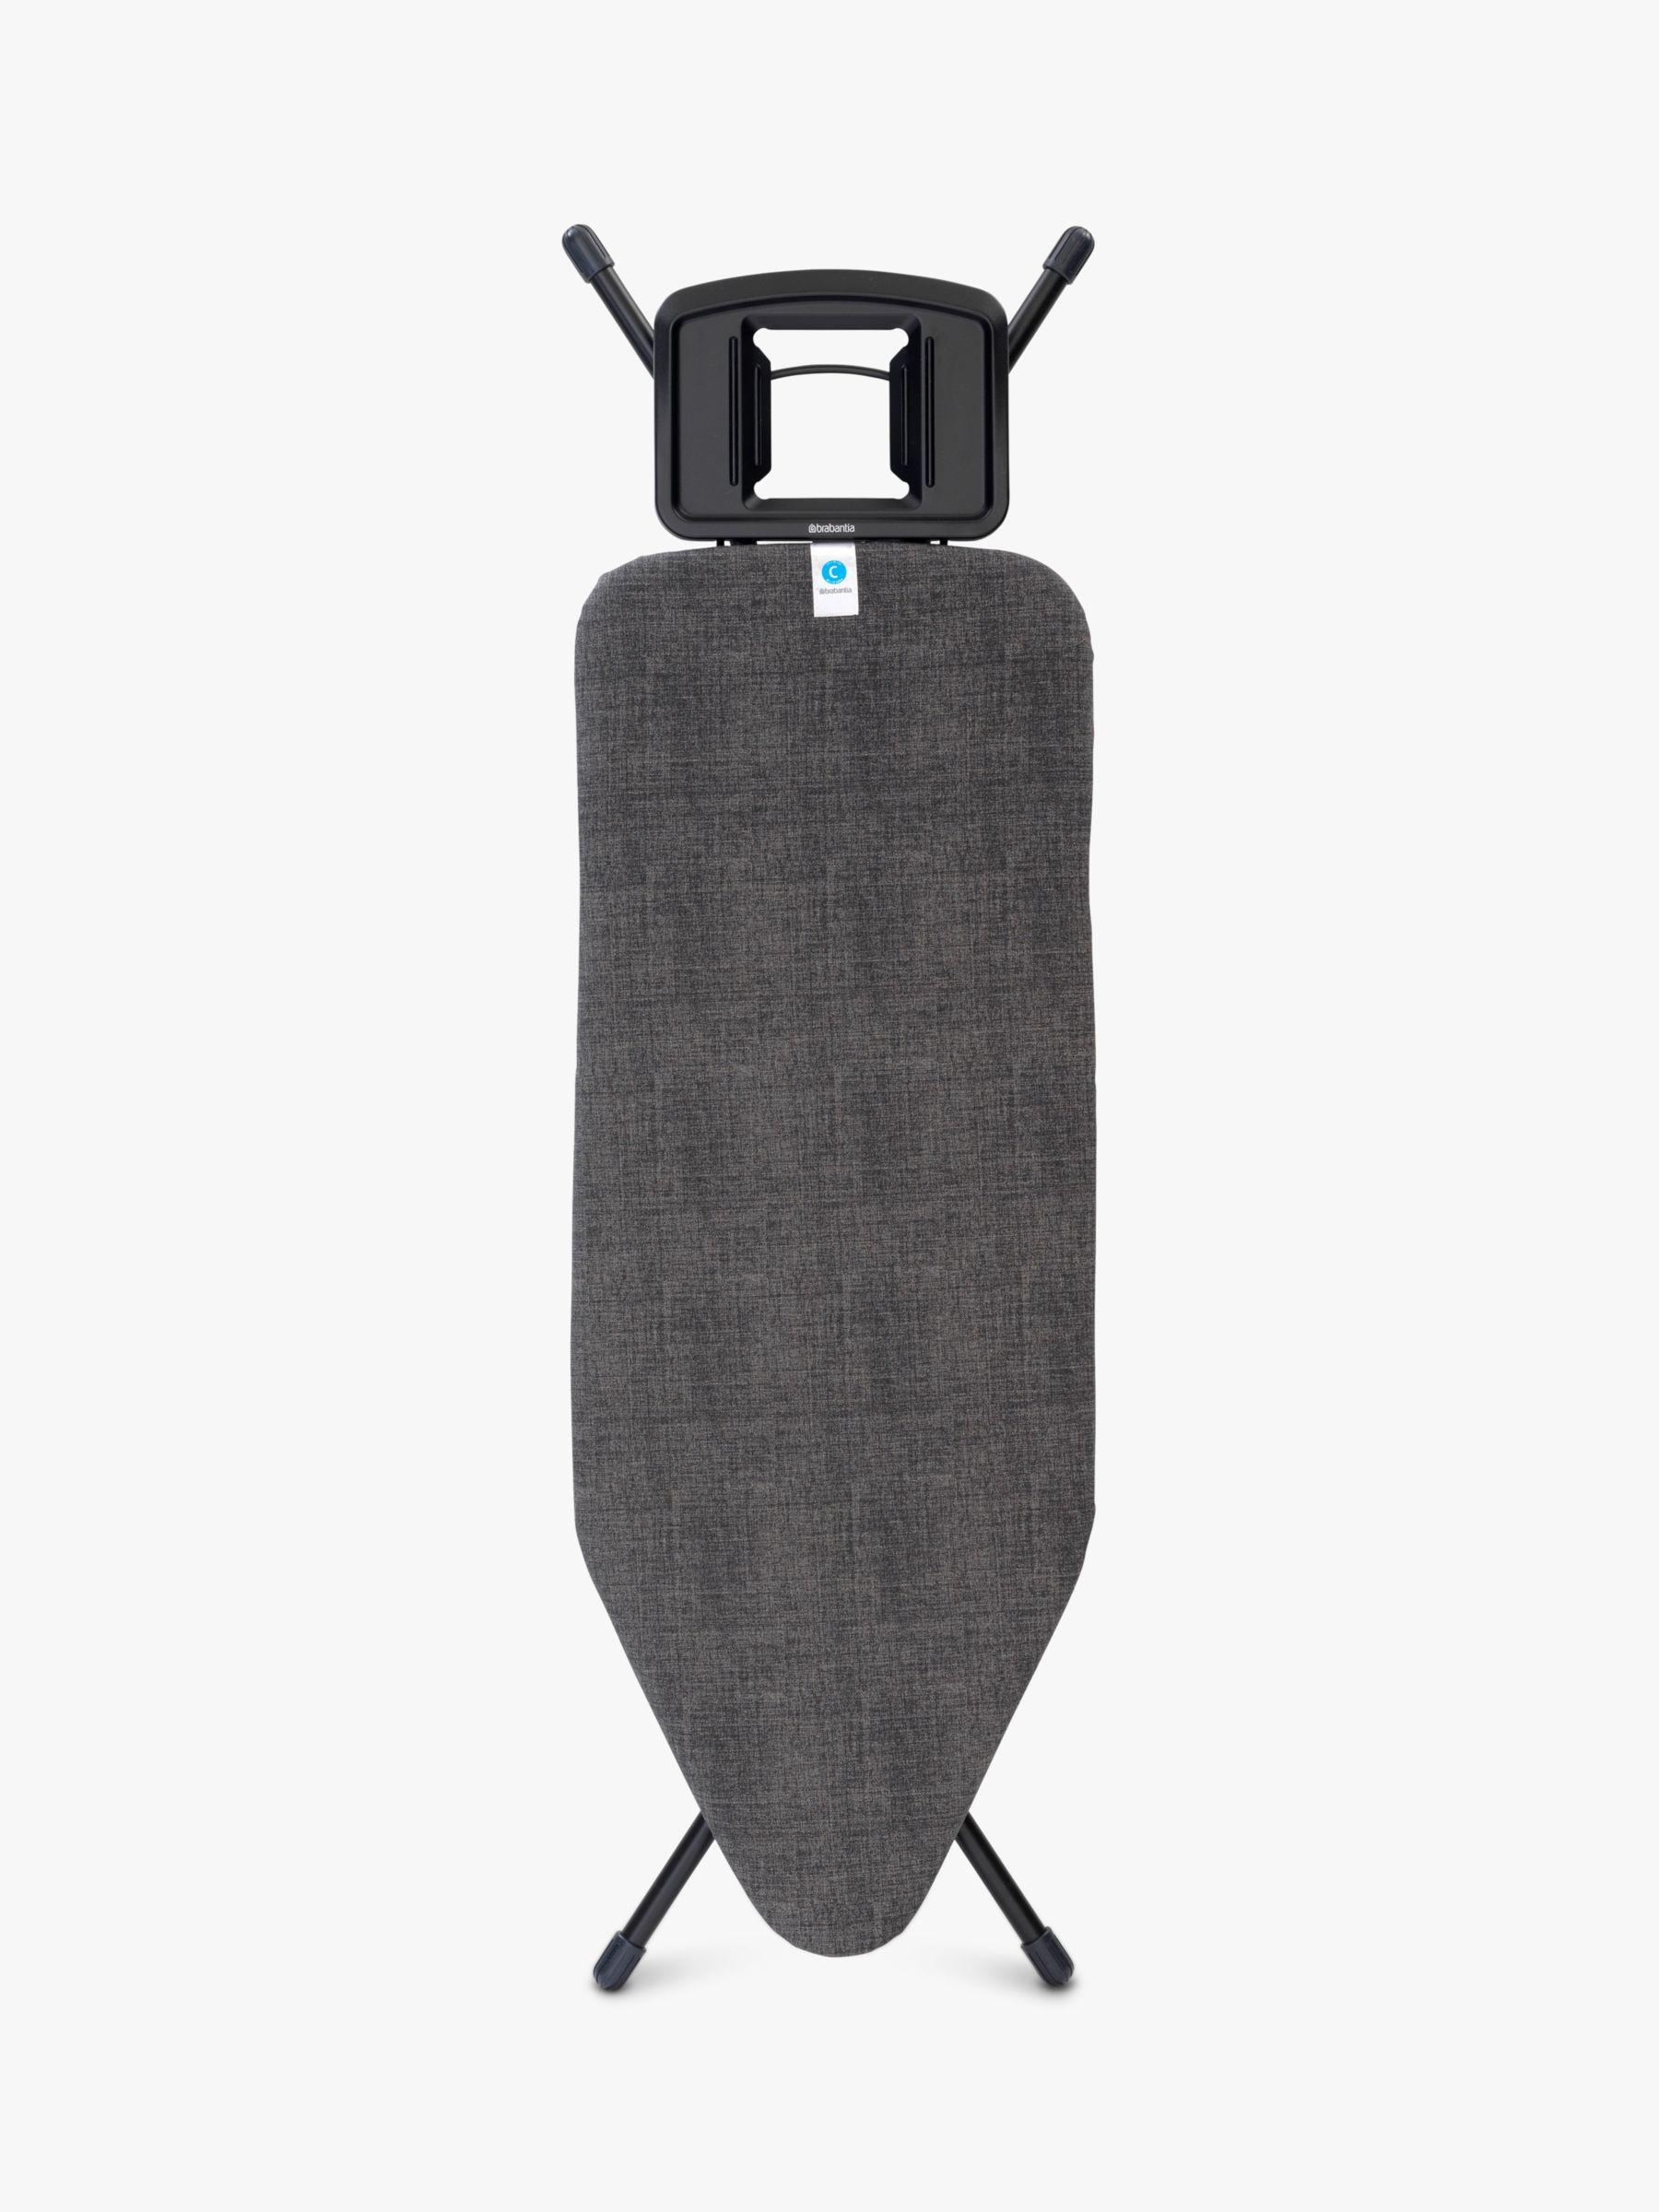 Brabantia Extra Large Ironing Board, Denim Black, L124 x W45cm